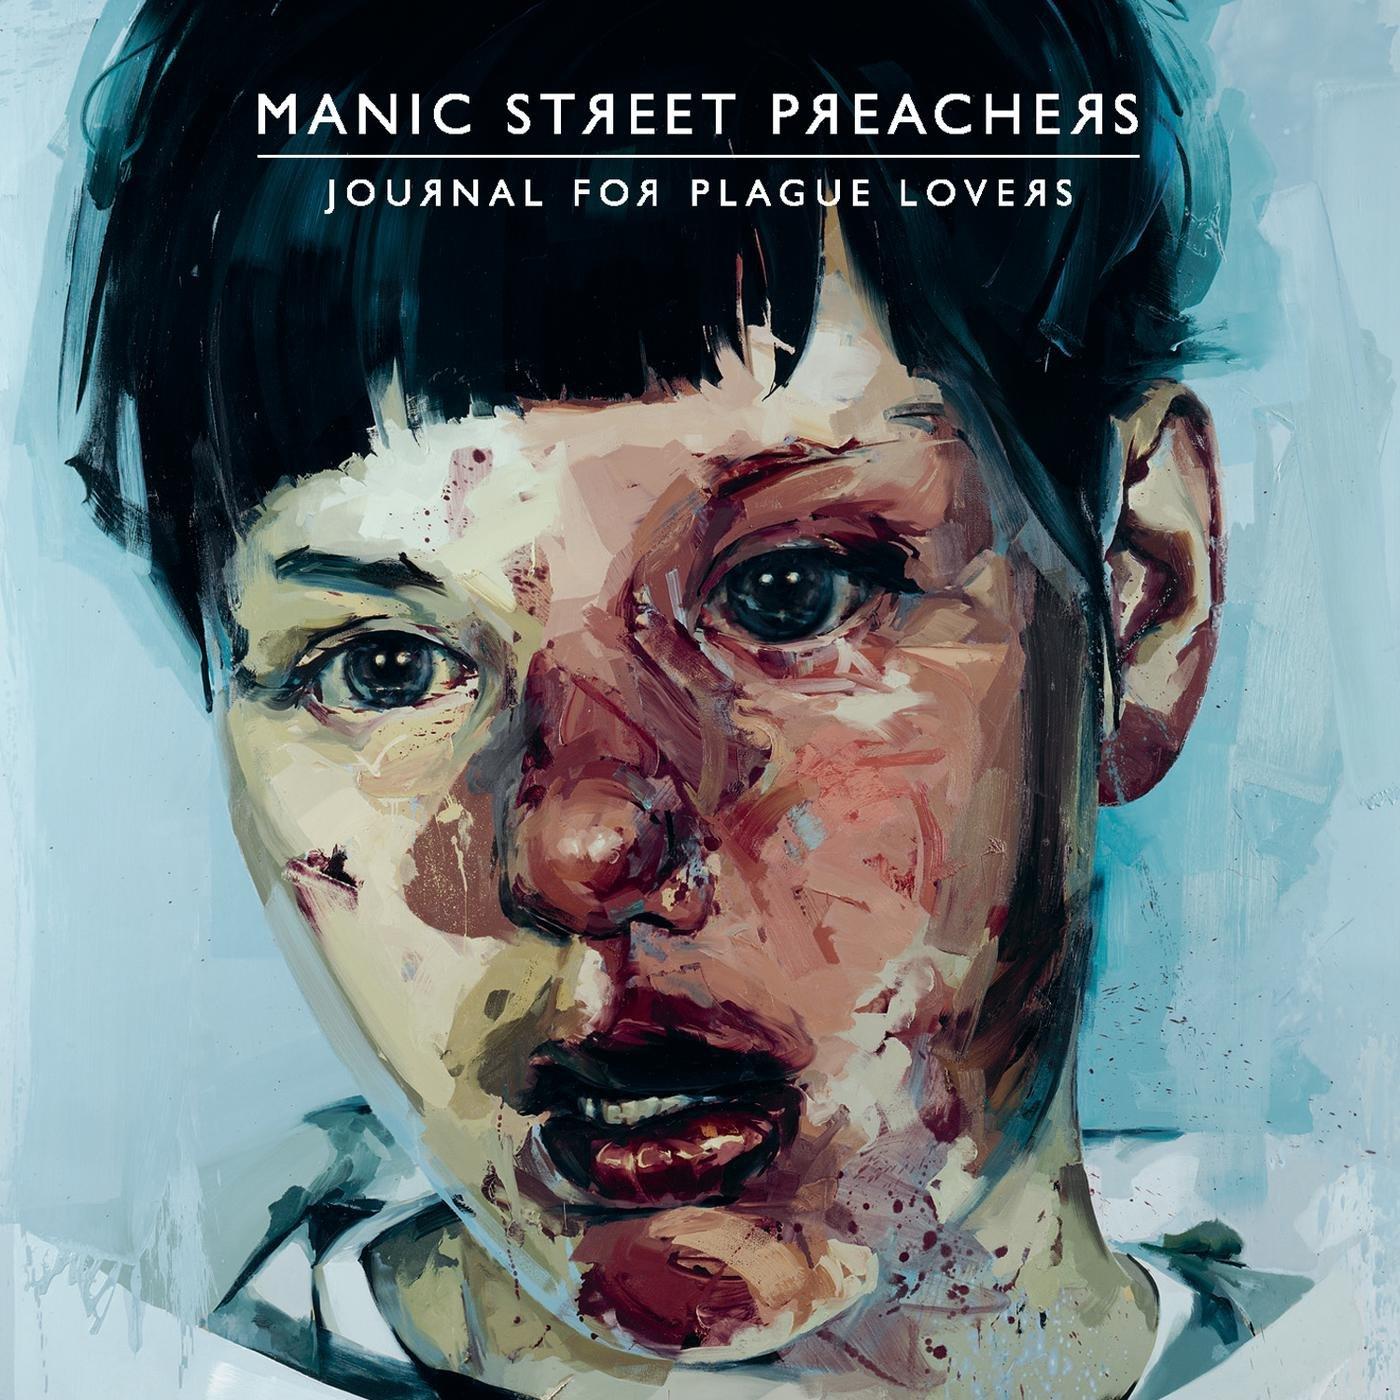 Manic Street Preachers - Journal For Plague Lovers (2009) [FLAC] Download